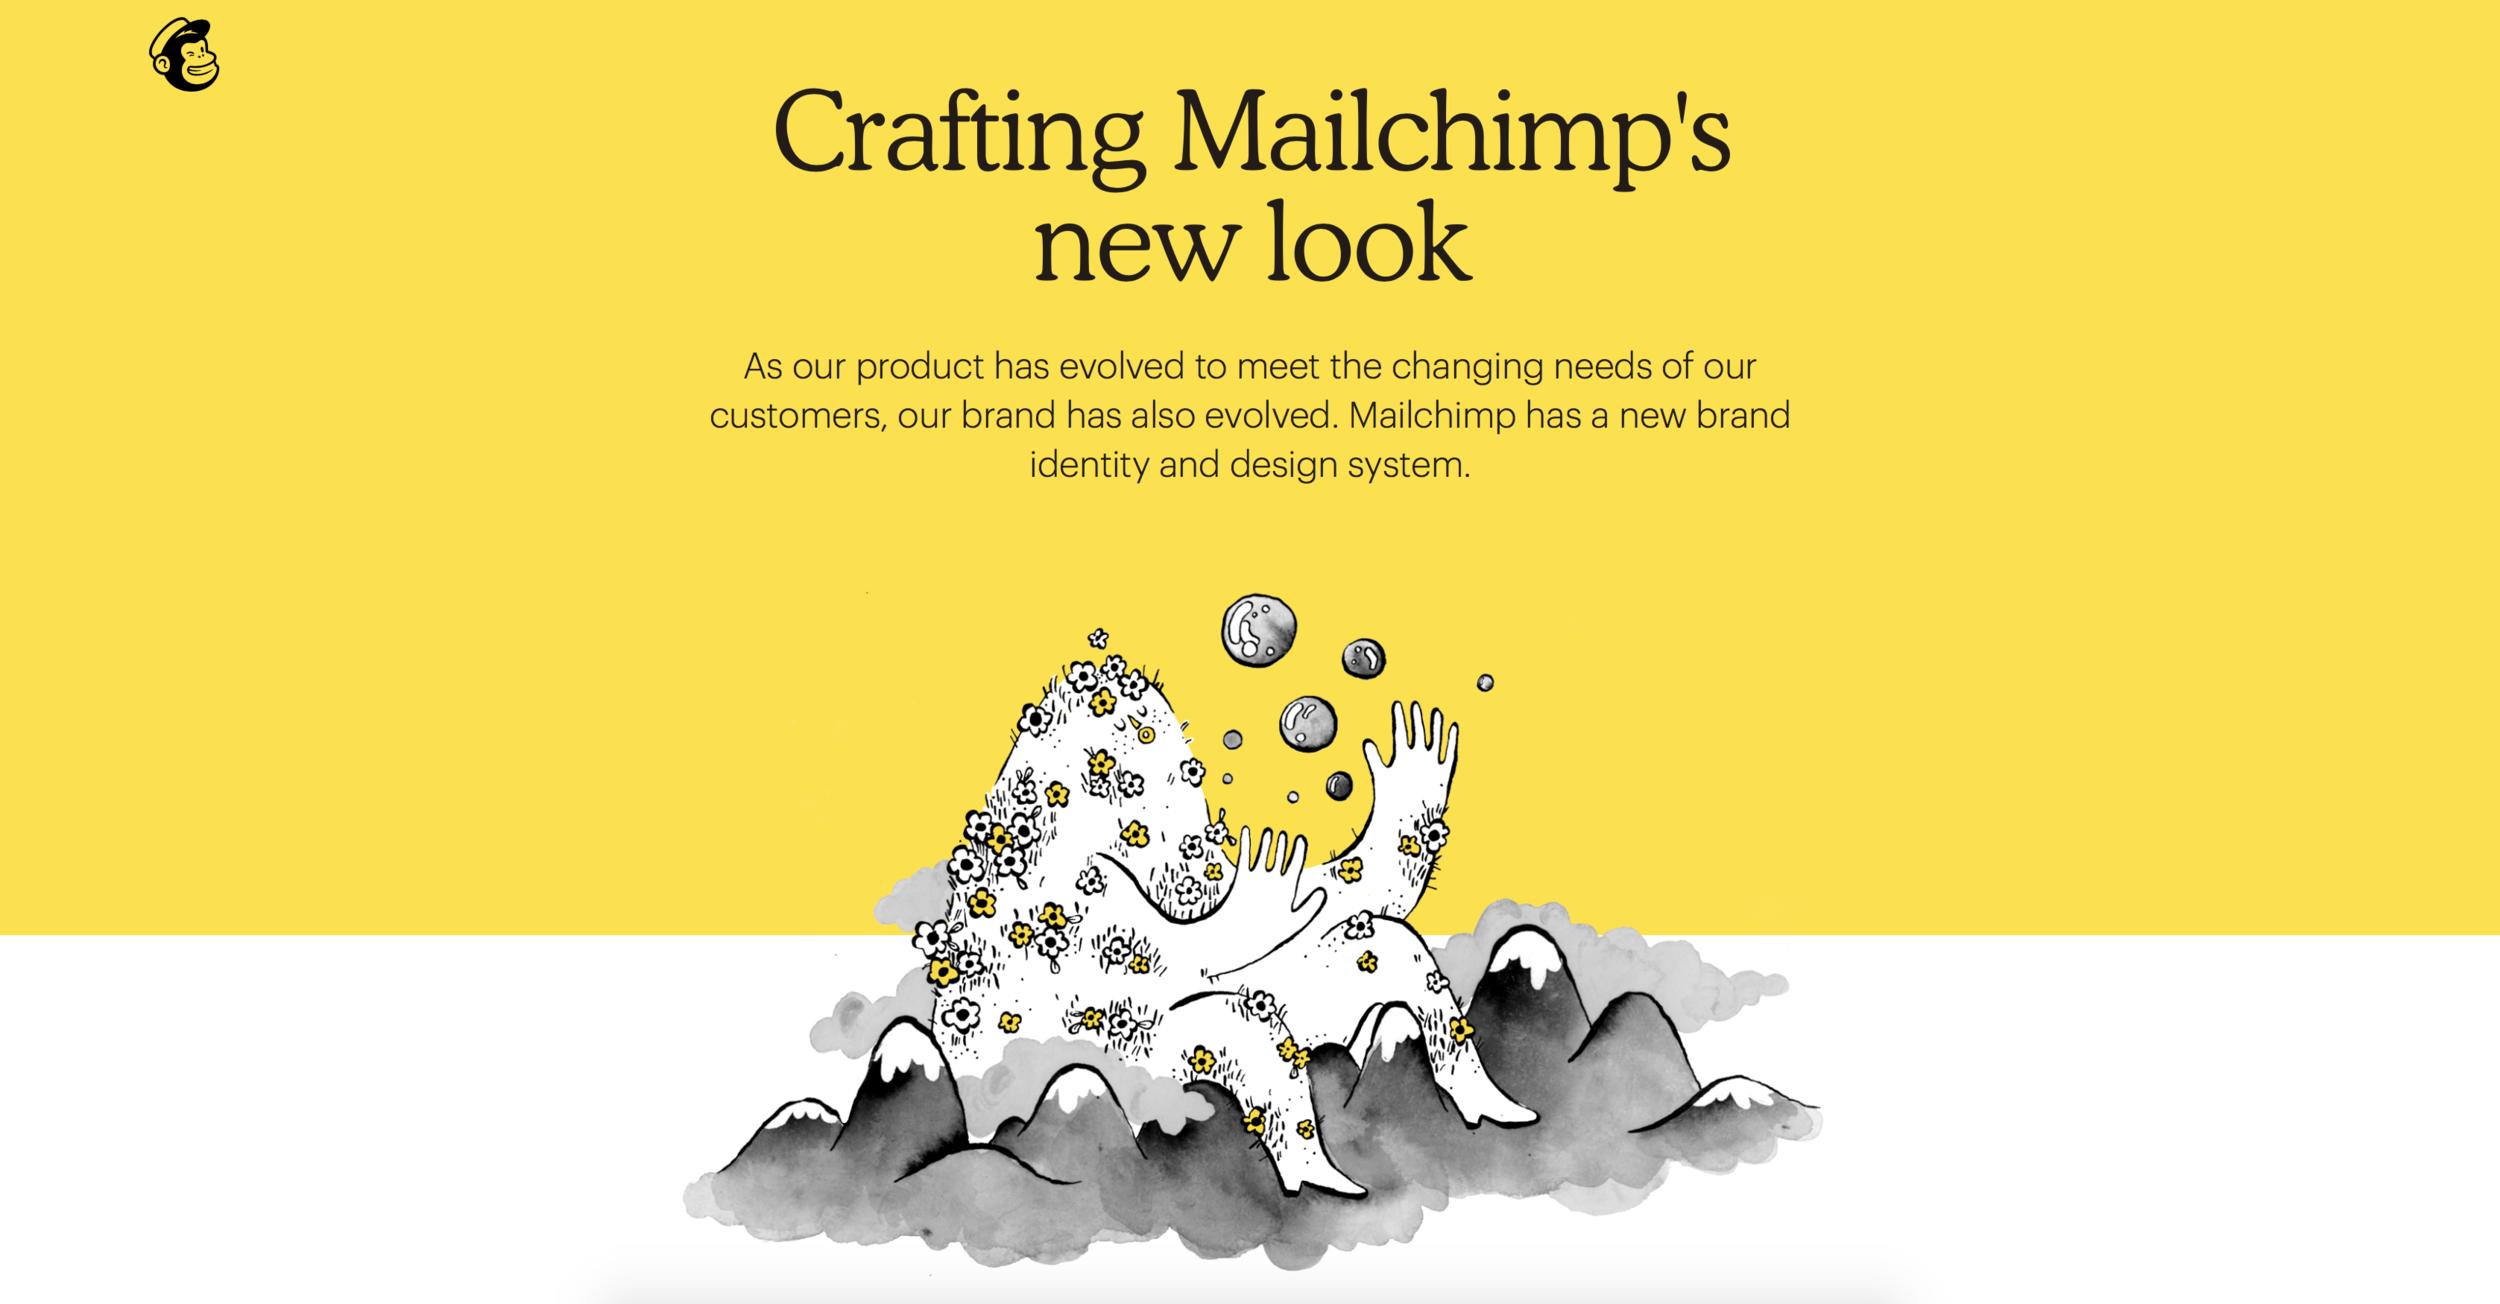 Mailchimp Design | Crafting Mailchimp's New Look